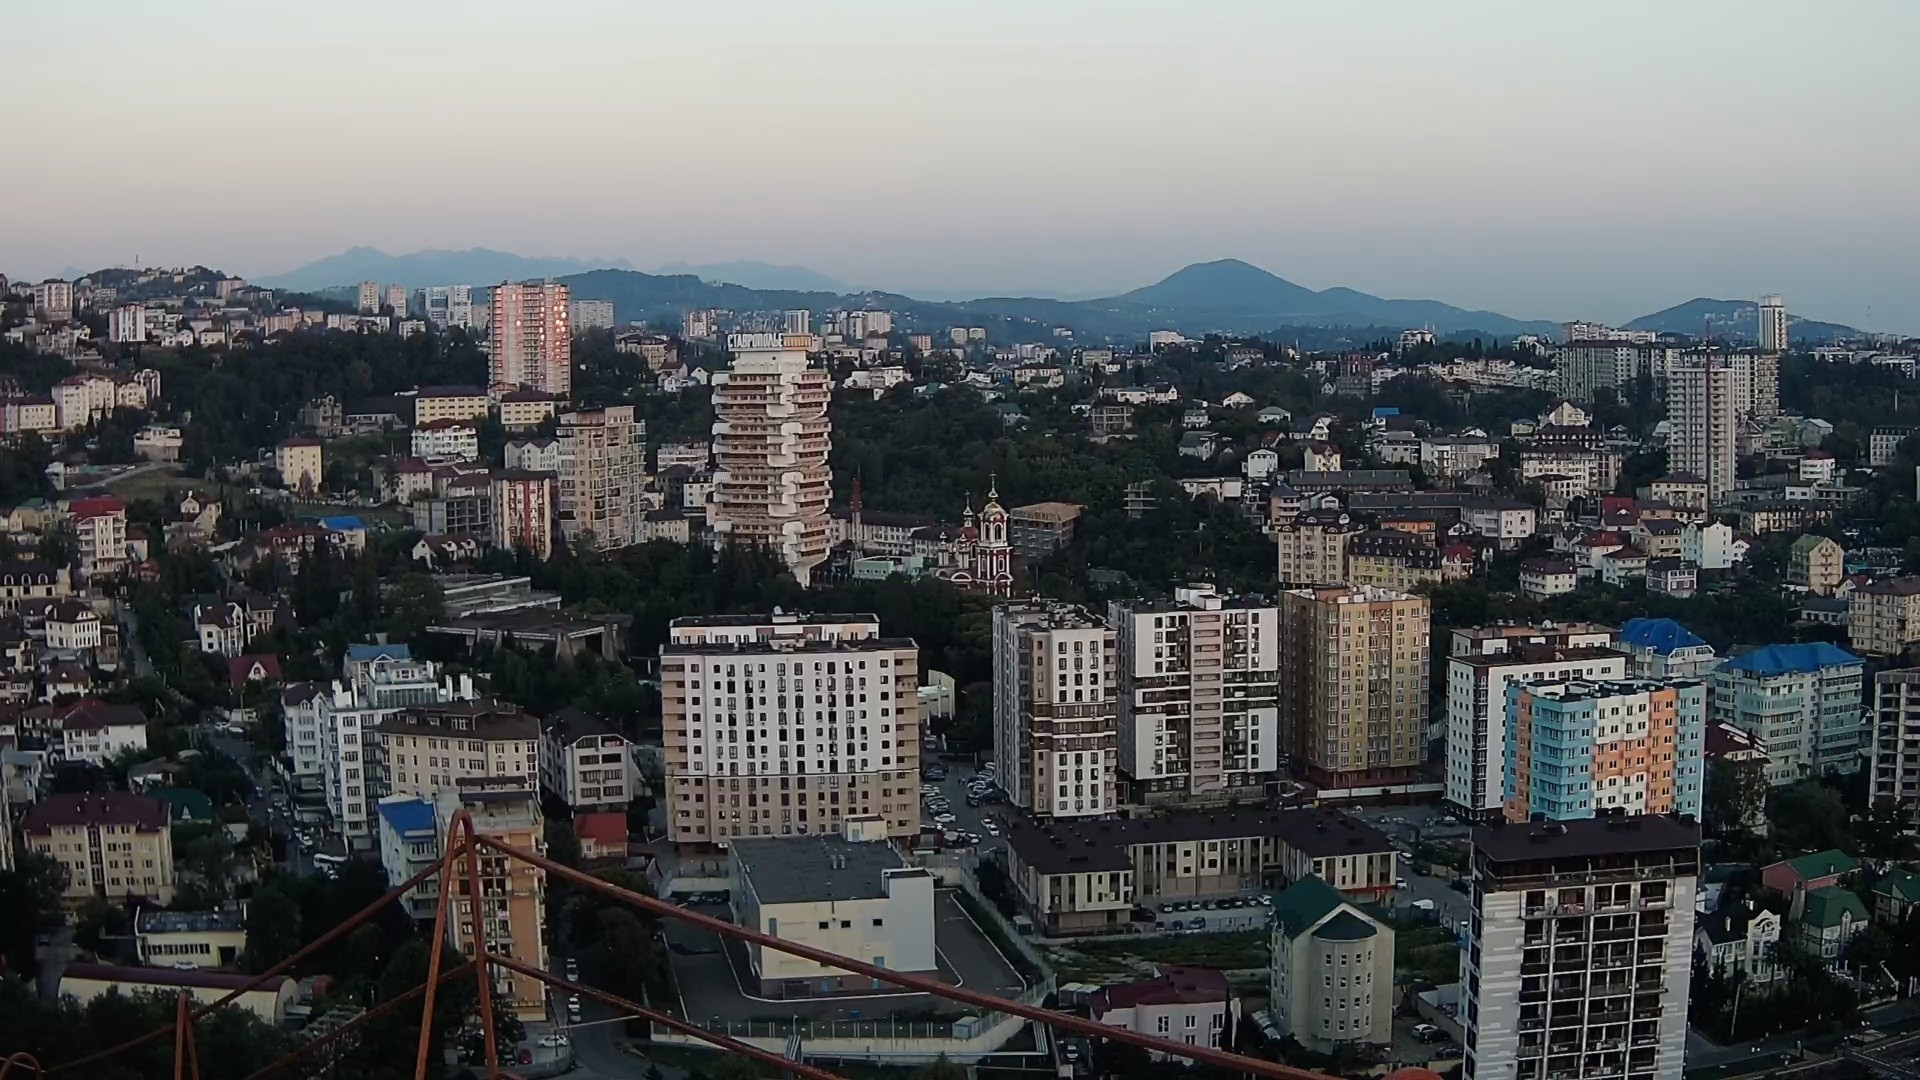 Вебкамера в г. Сочи, панорама микрорайона Мамайка